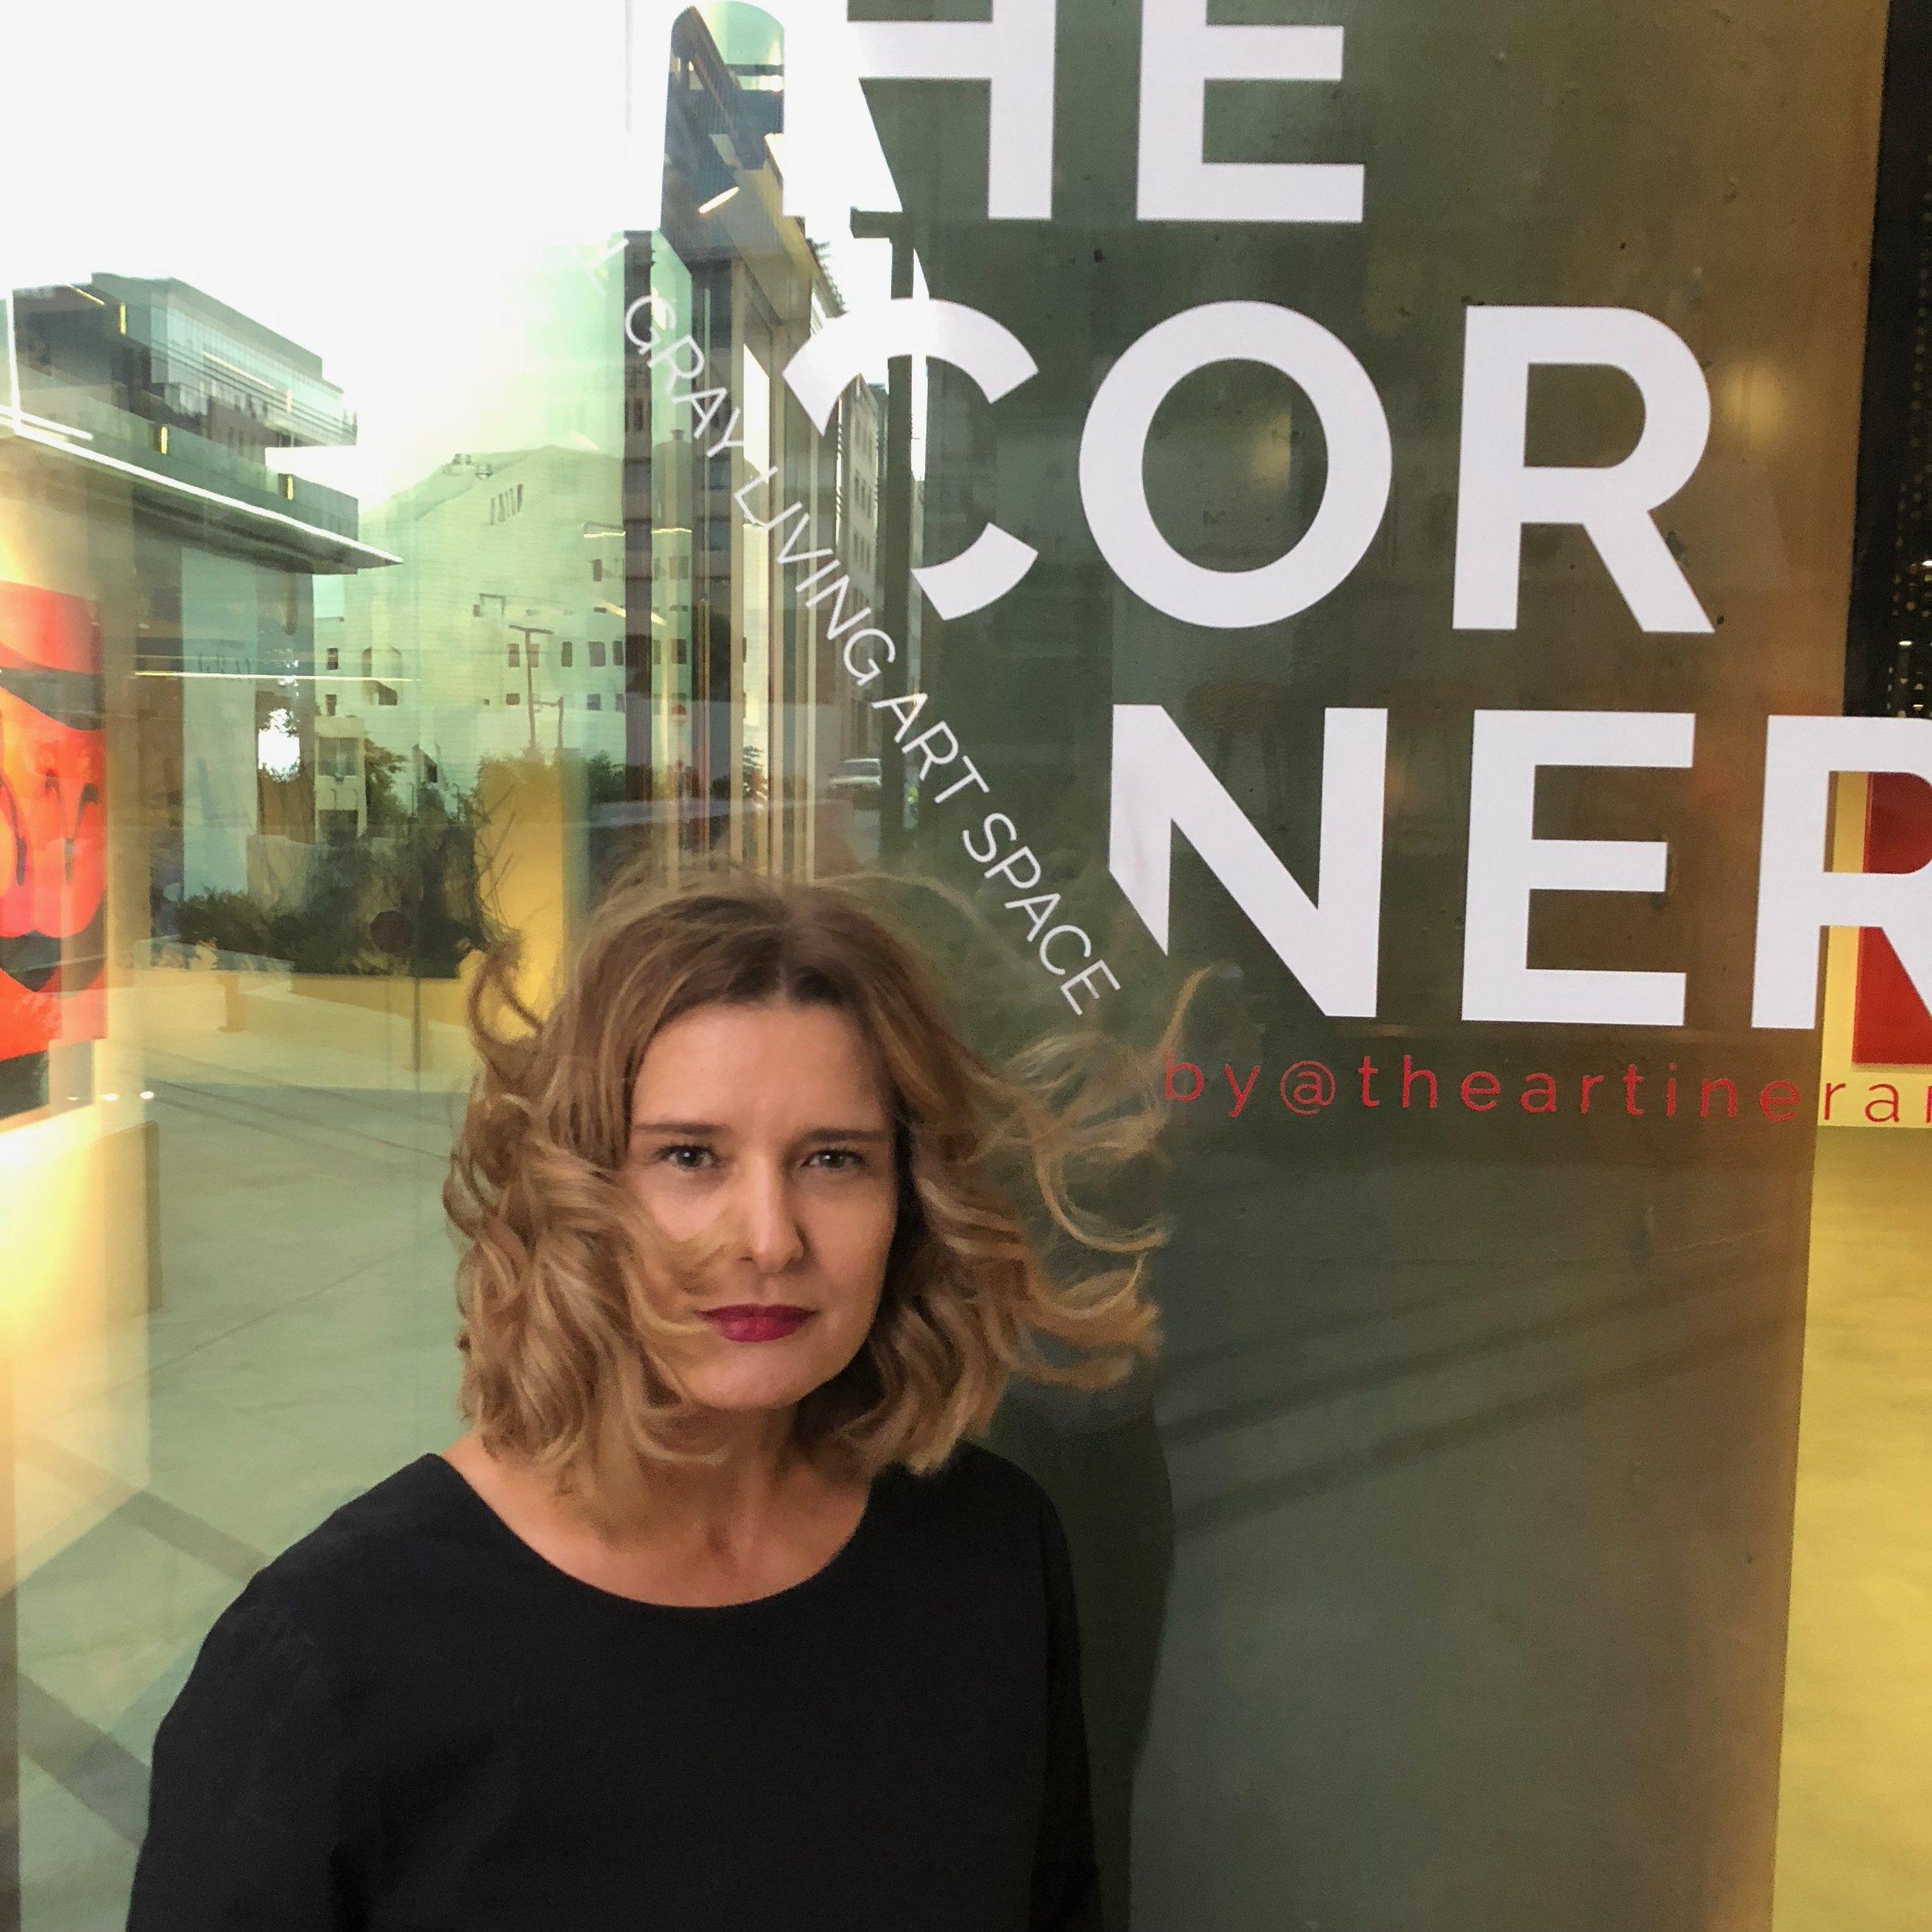 The Corner art gallery